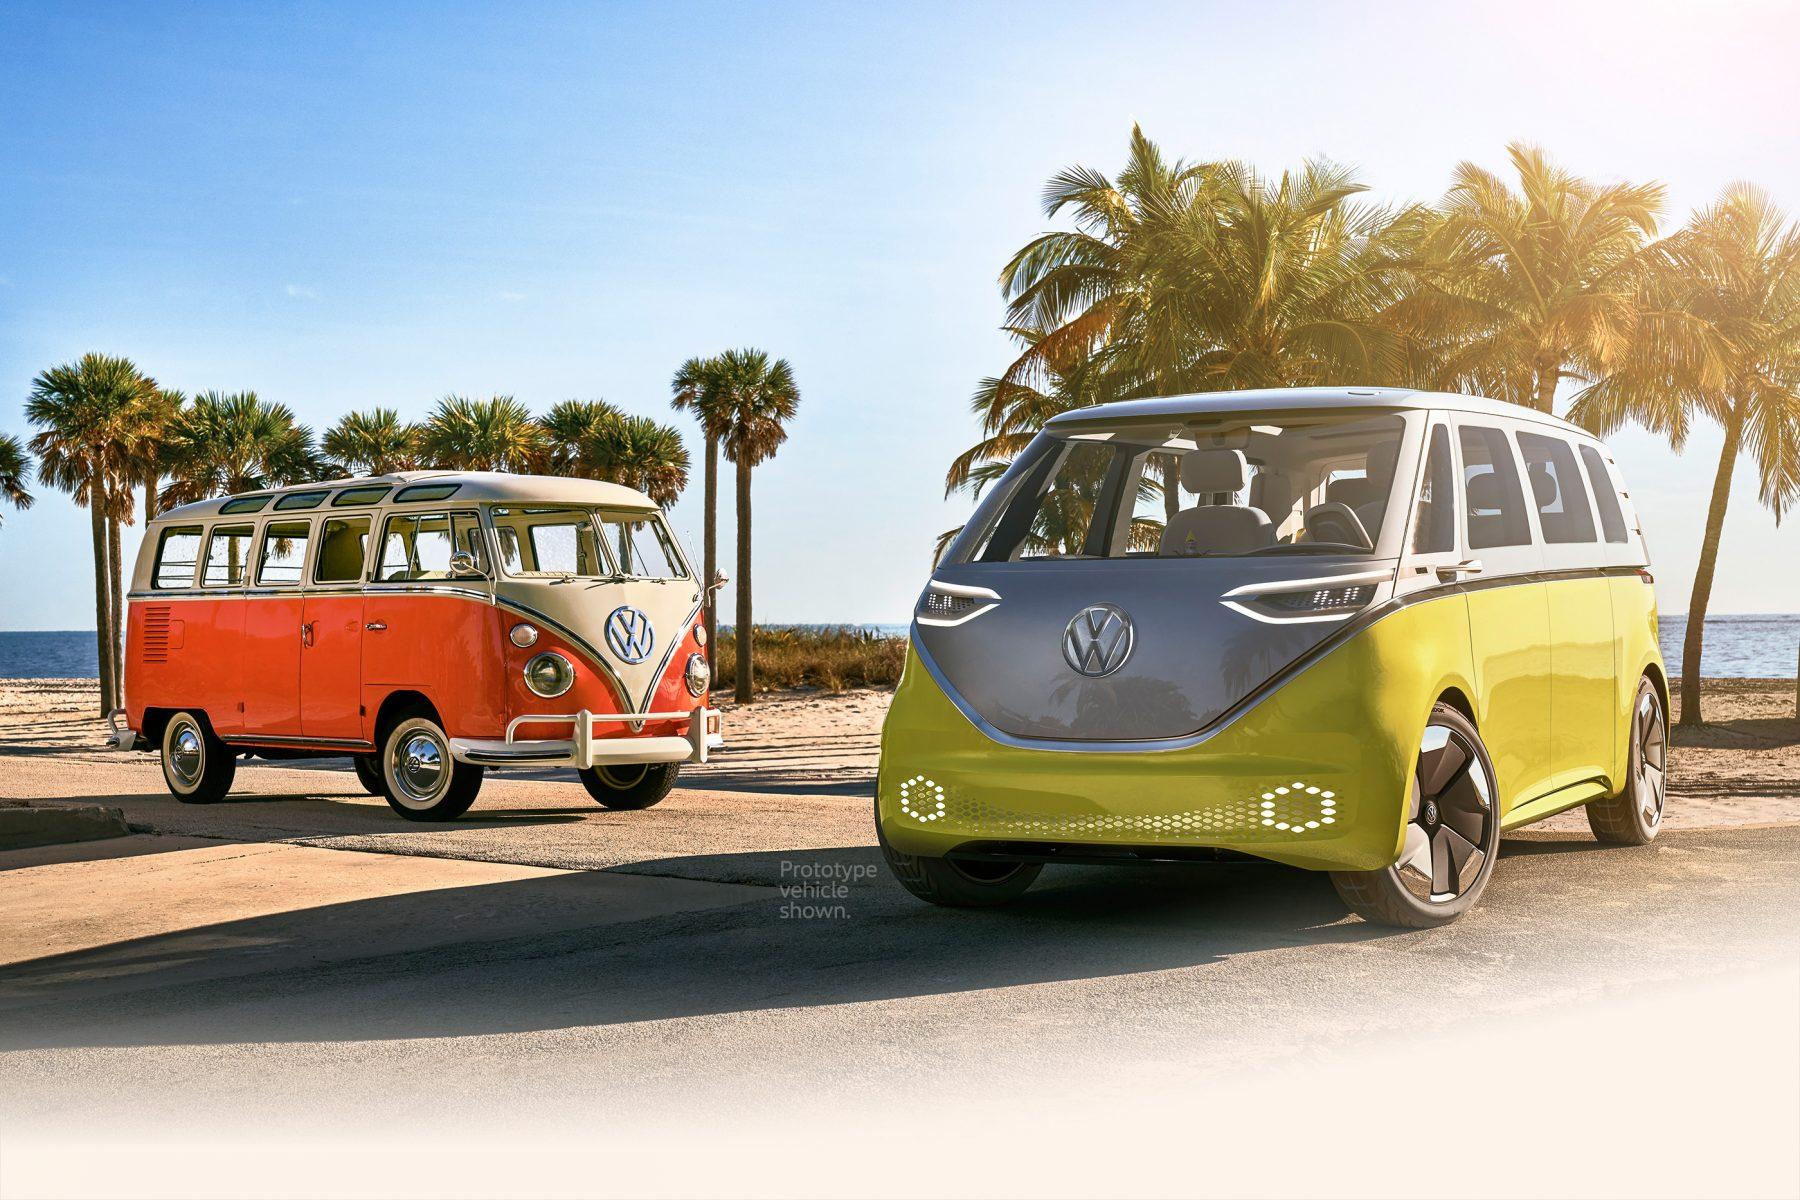 VW electric microbus